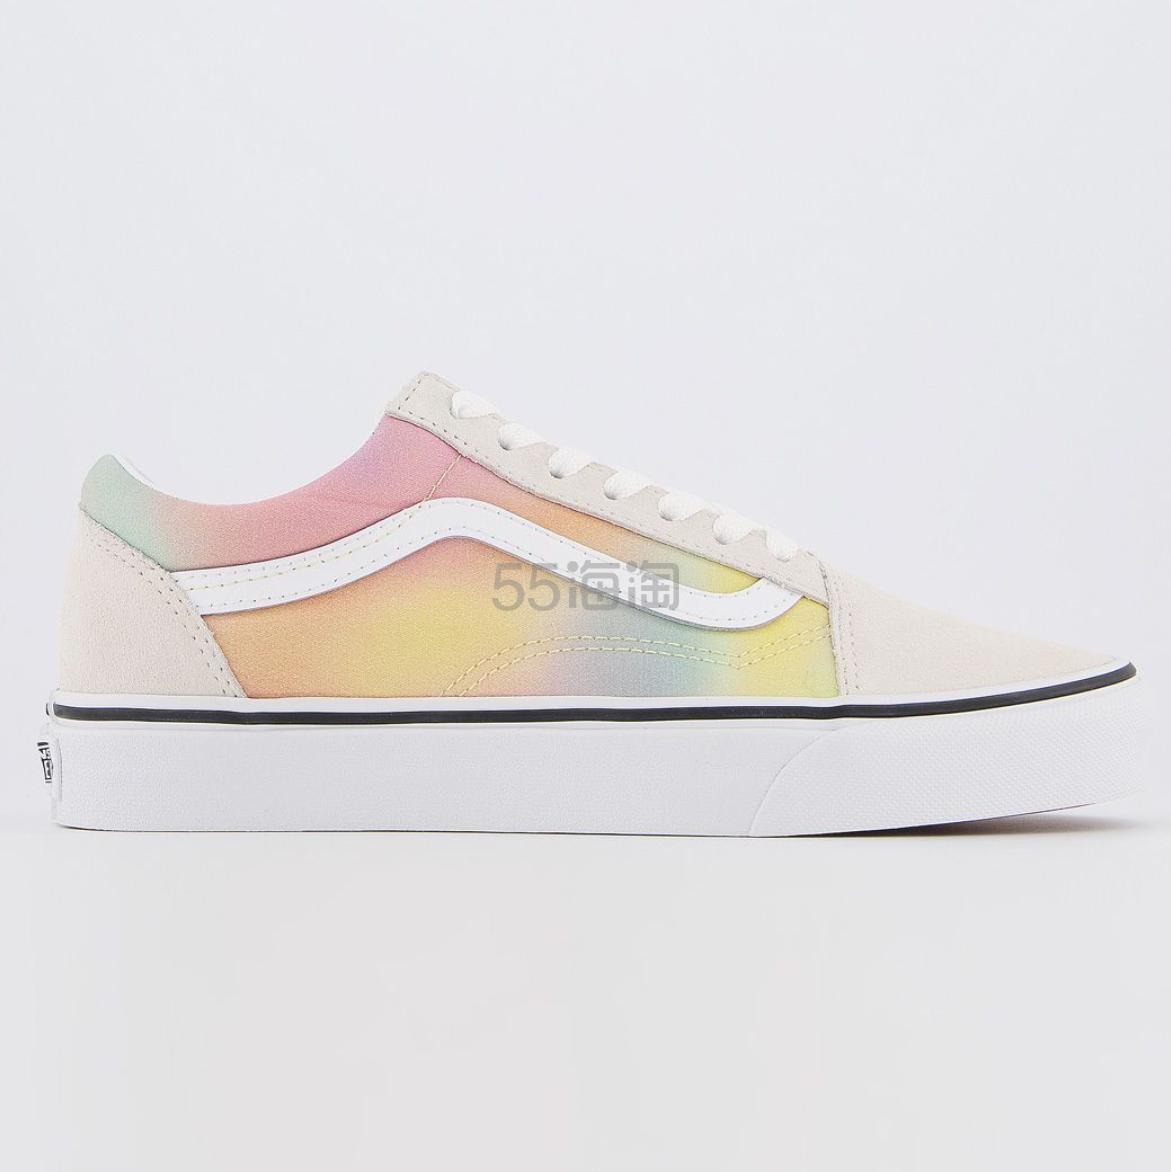 Vans Old Skool 女款渐变滑板鞋 (约589元) - 海淘优惠海淘折扣|55海淘网